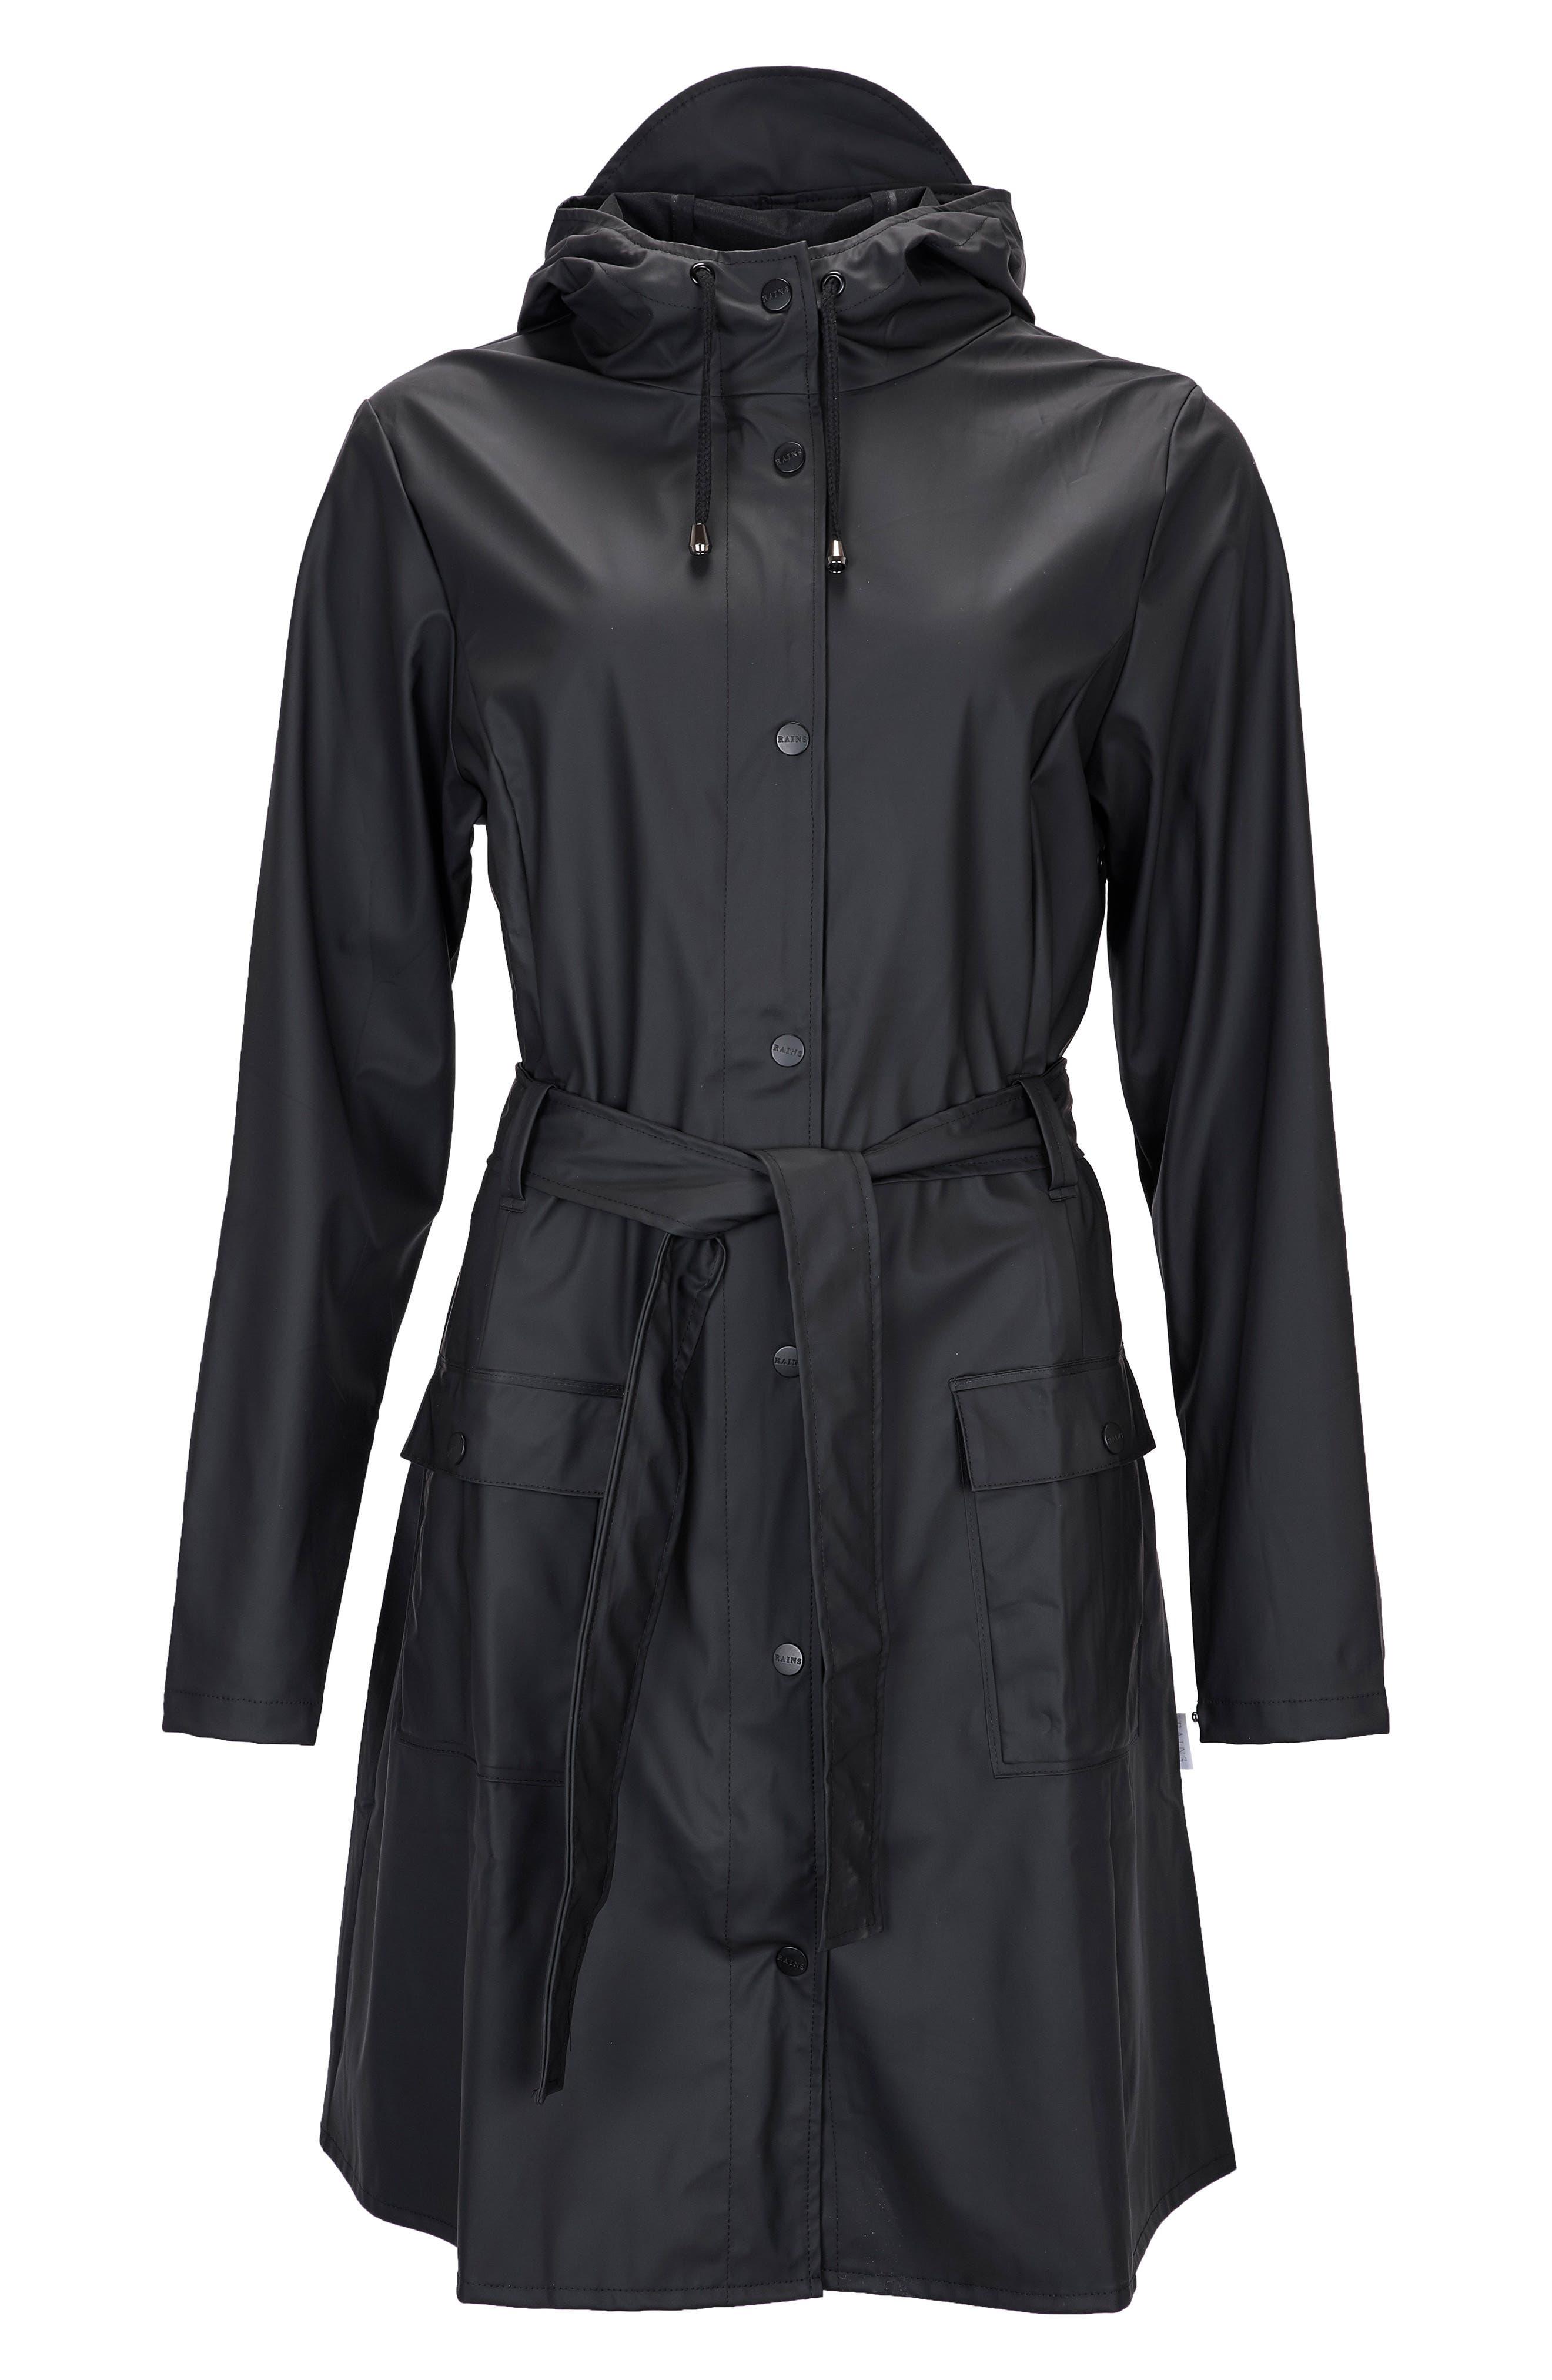 Curve Waterproof Hooded Rain Jacket,                             Alternate thumbnail 3, color,                             BLACK